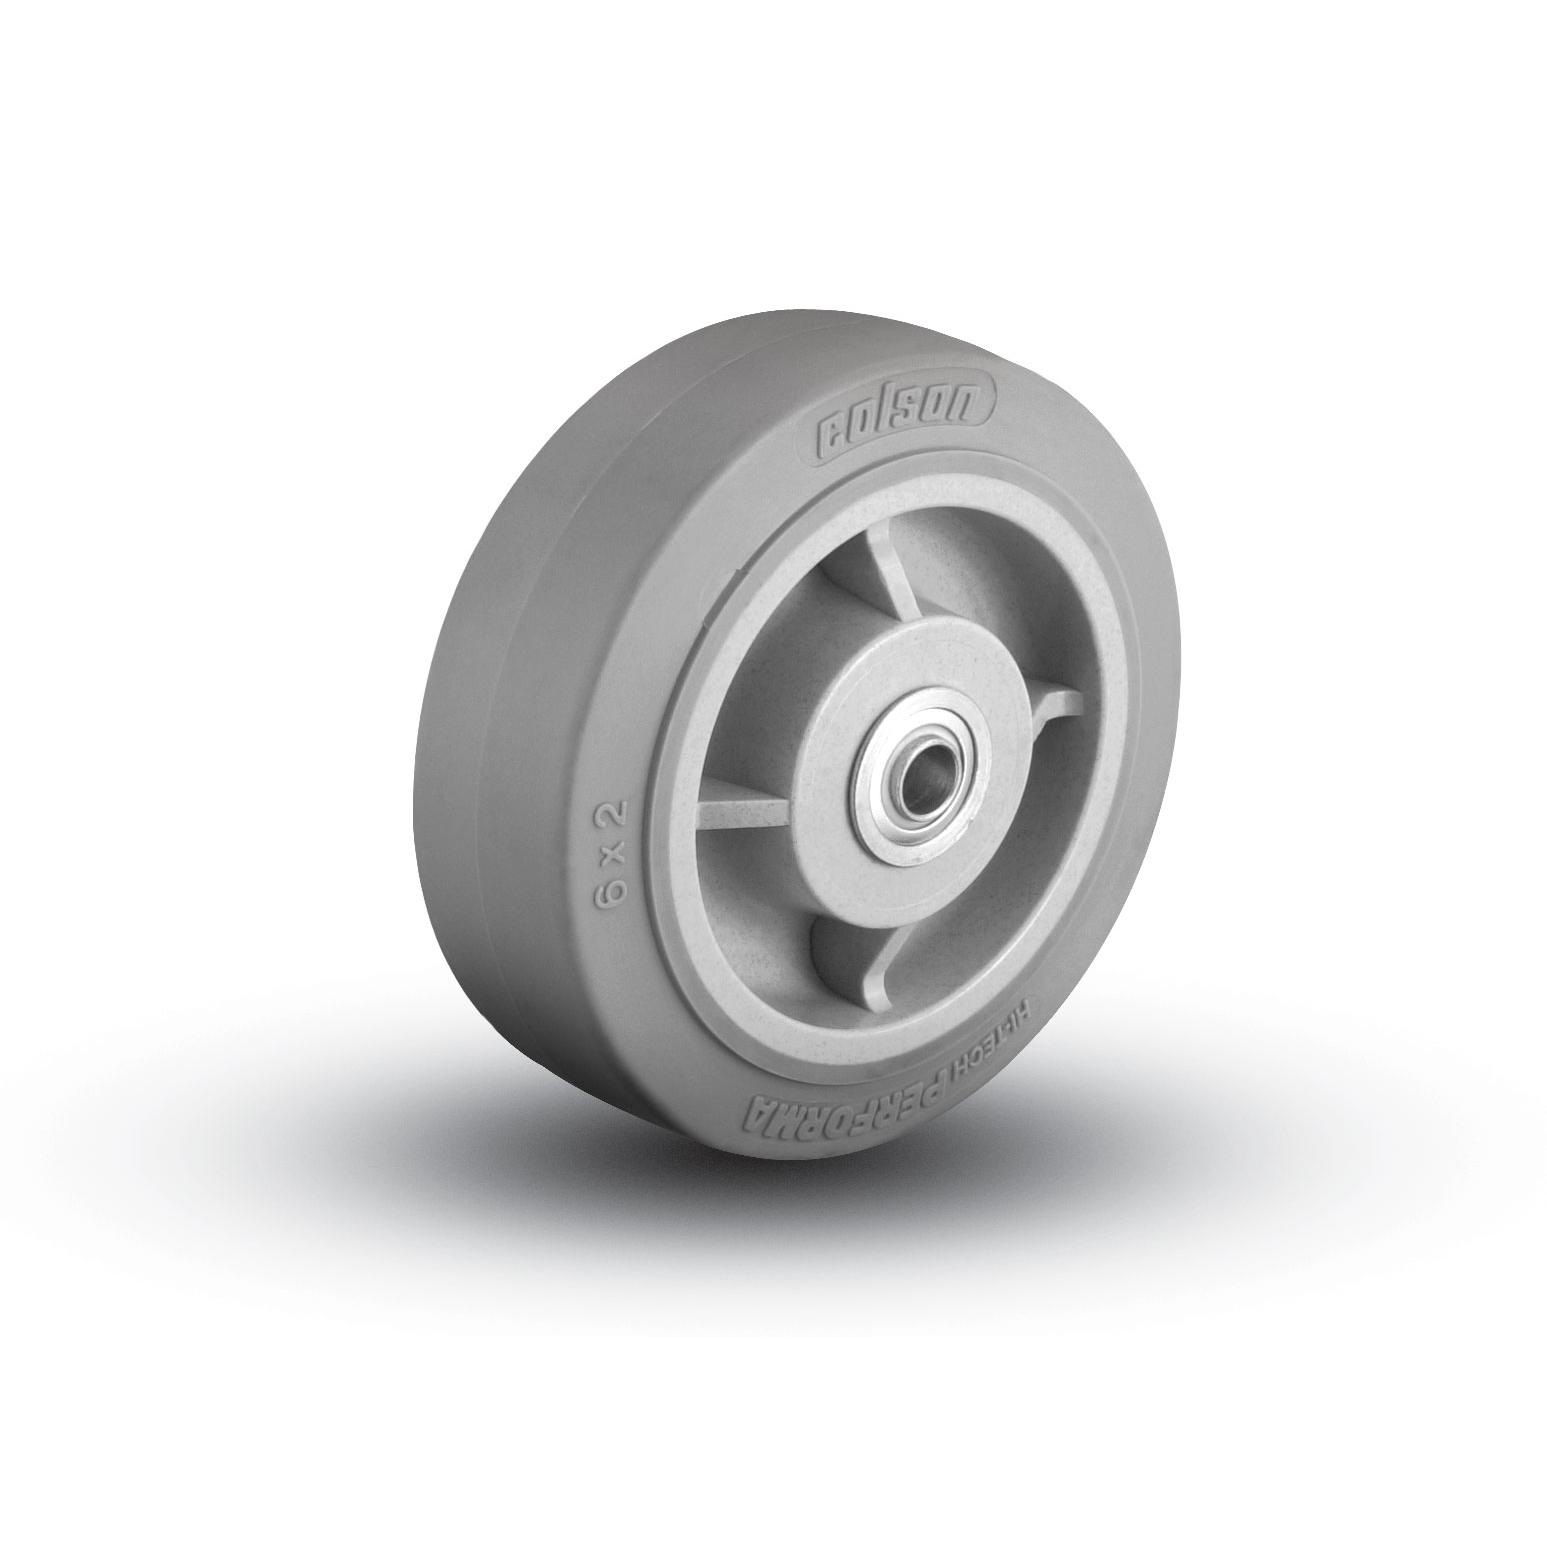 Colson Performa Wheels